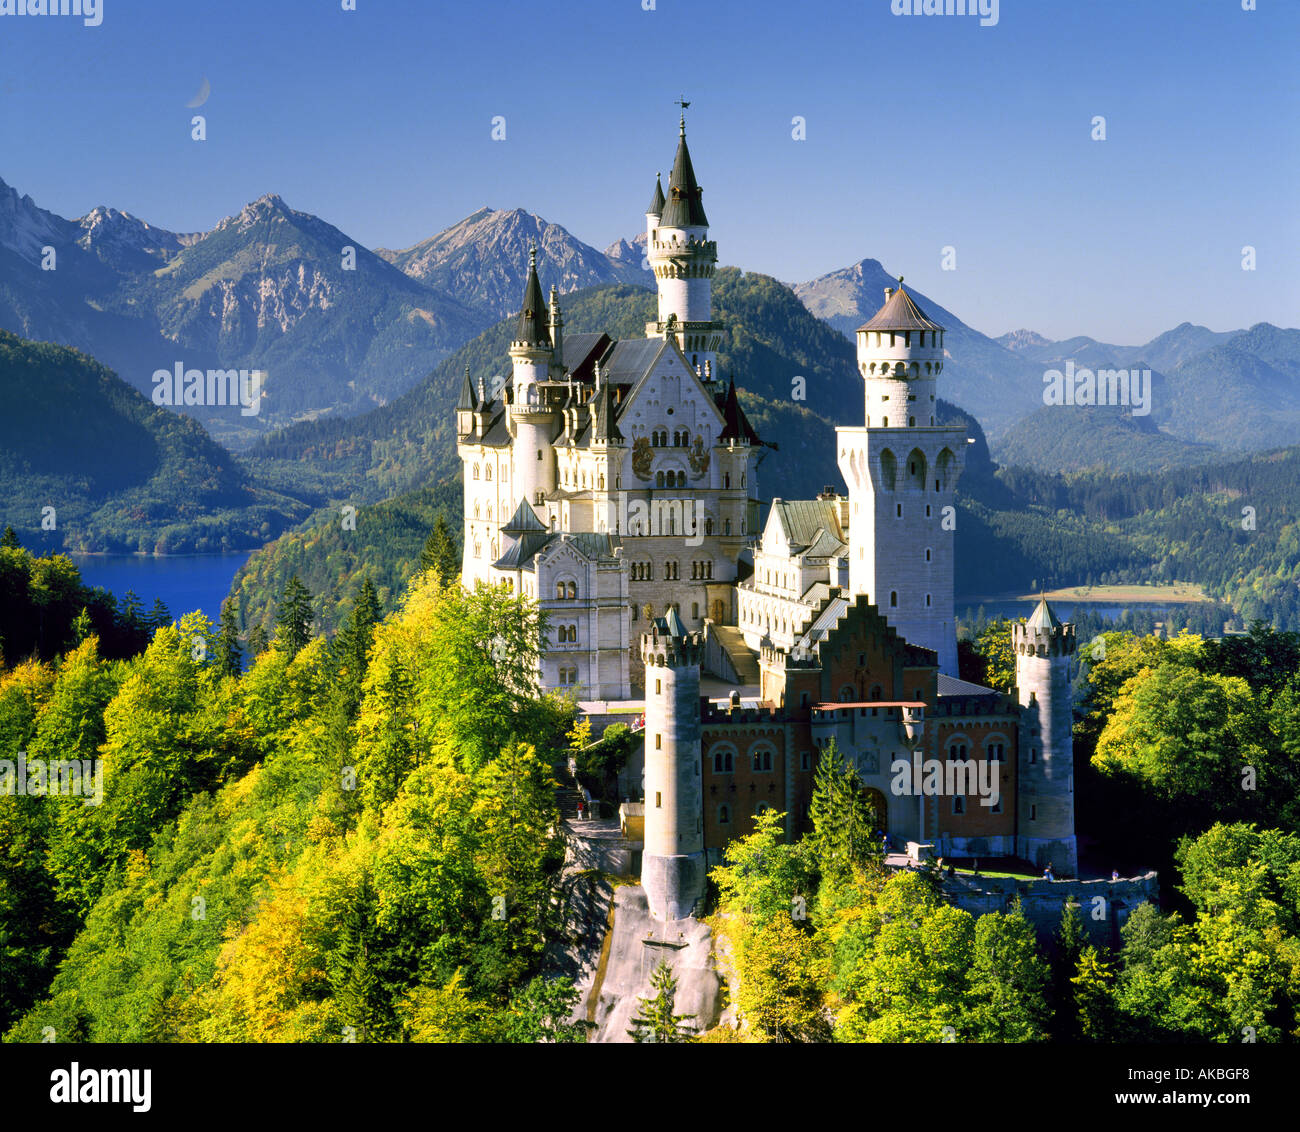 DE - La Bavière: Château de Neuschwanstein Photo Stock